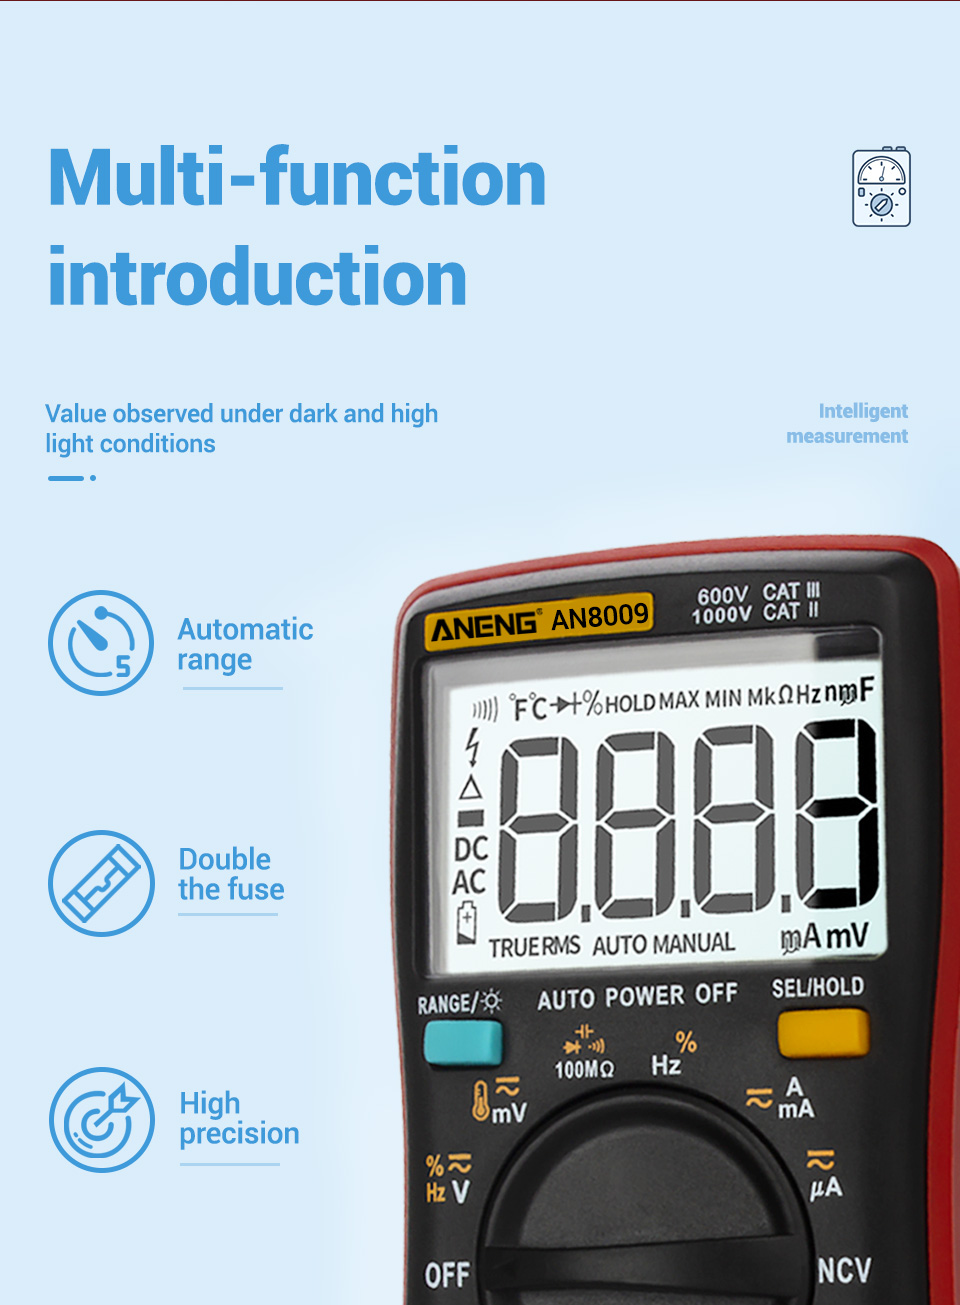 H4c3287a98fe04a3087f80021f727d0c72 ANENG AN8009 True-RMS Digital Multimeter transistor tester capacitor tester automotive electrical capacitance meter temp diode